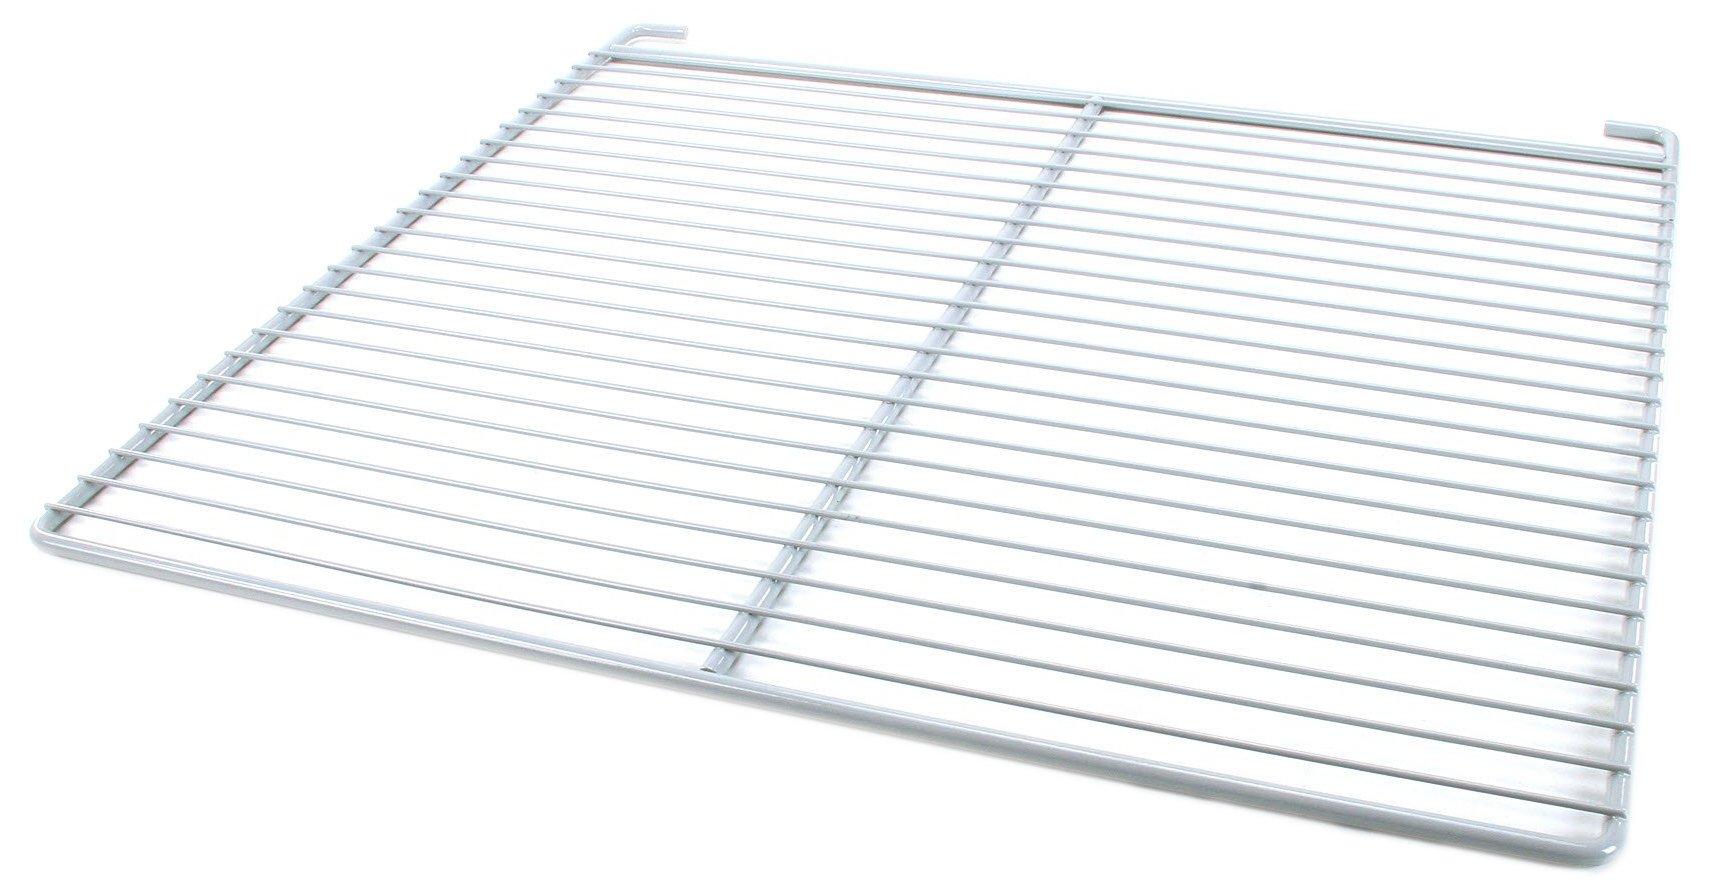 Traulsen 340-60179-02, Wire Shelf 2 Sect W/Duct Epox by Traulsen